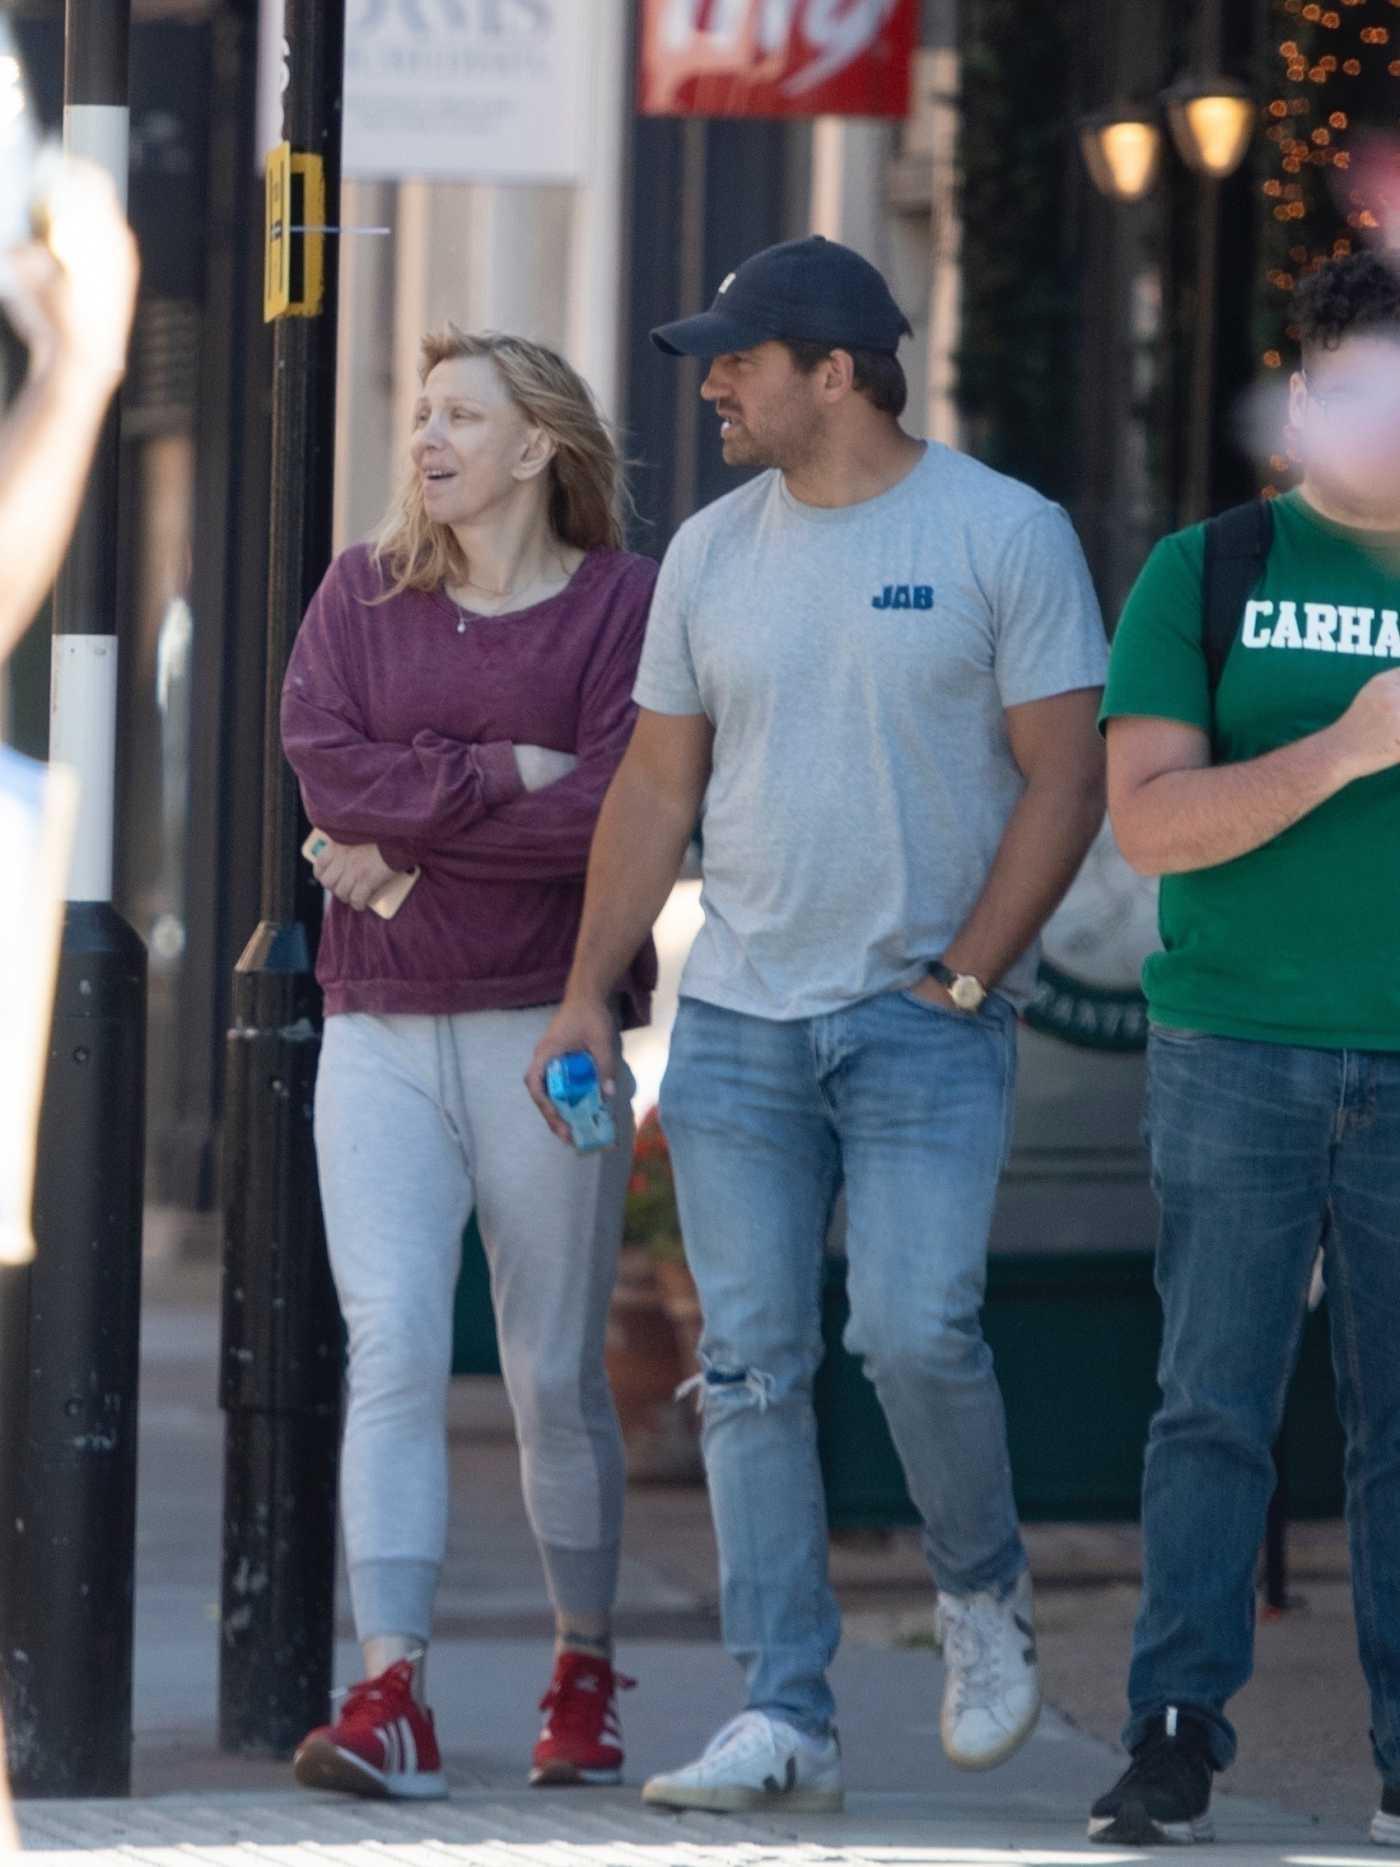 Courtney Love in a Purple Sweatshirt Was Seen Out with Alex Hemsley in London 05/29/2020